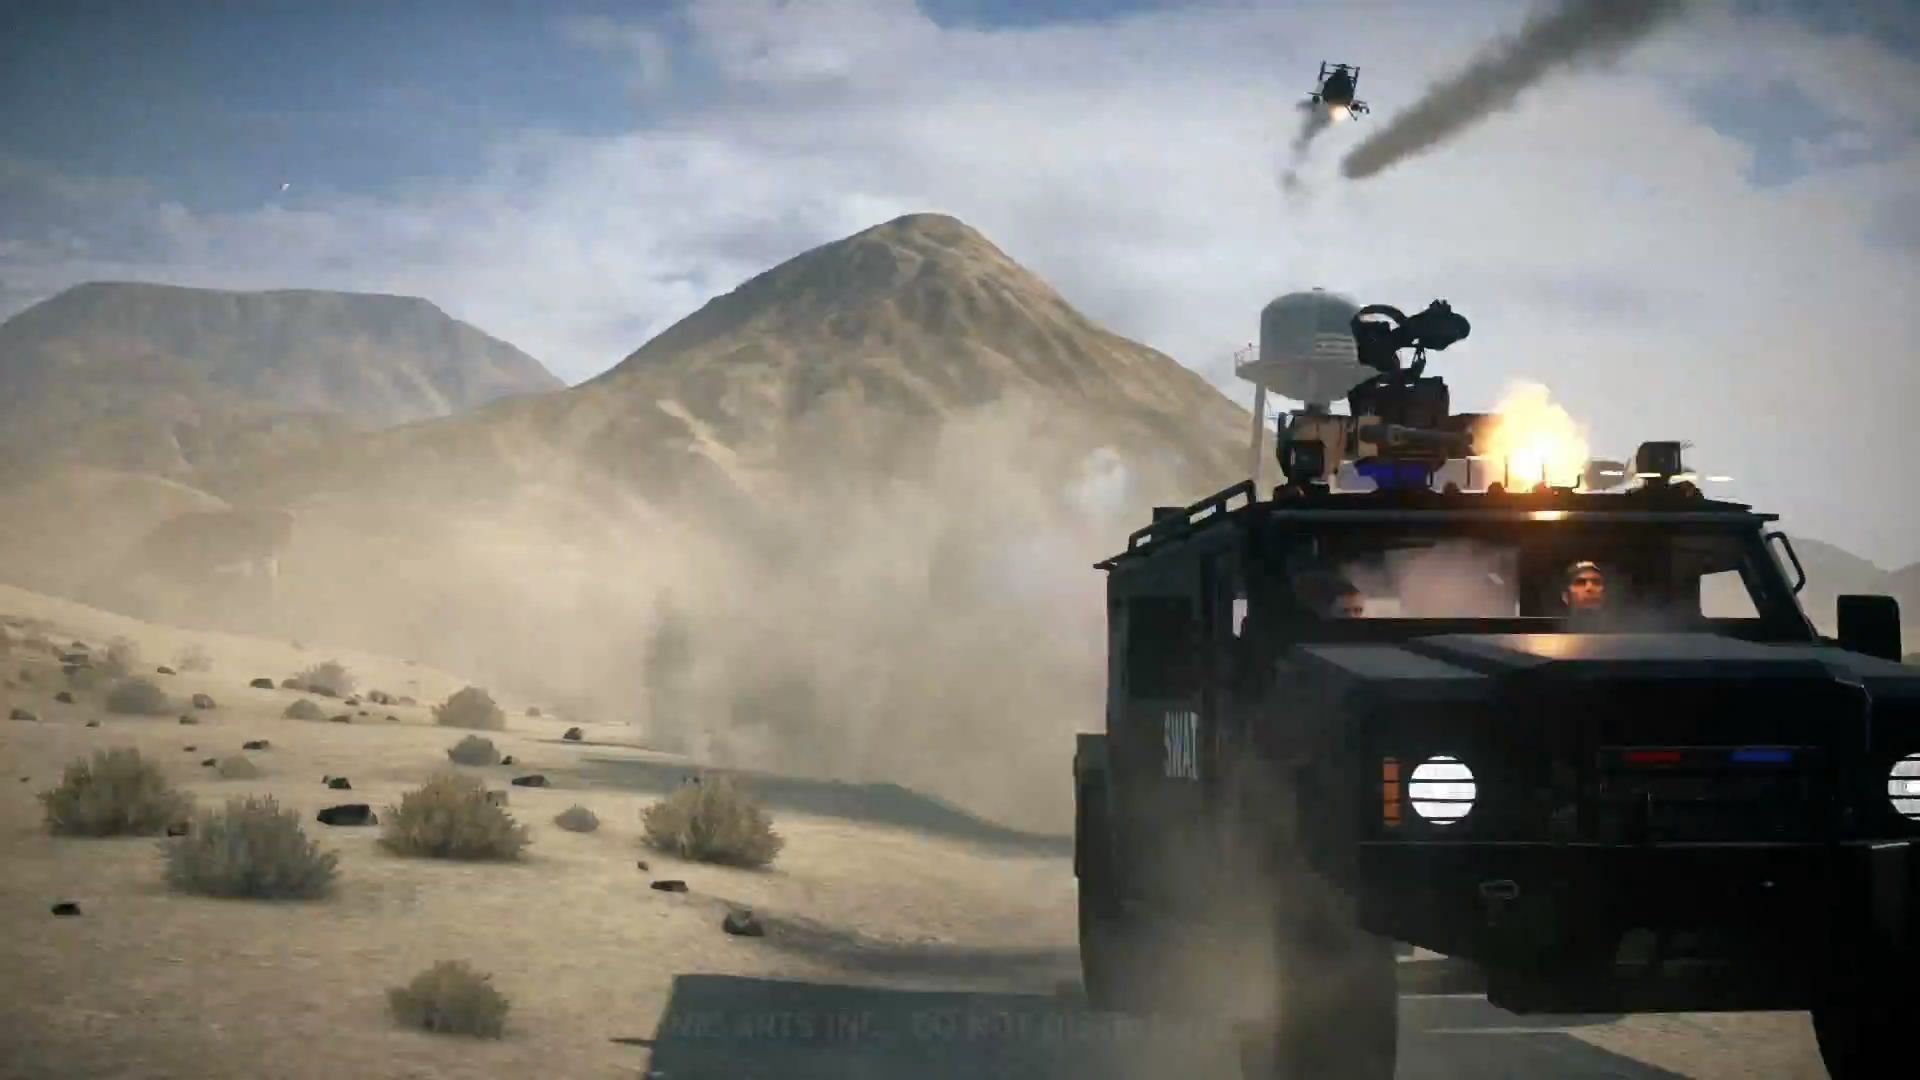 Battlefield-Hardline-Real-Gameplay.mp4_snapshot_00.13_2014.05.28_12.46.53